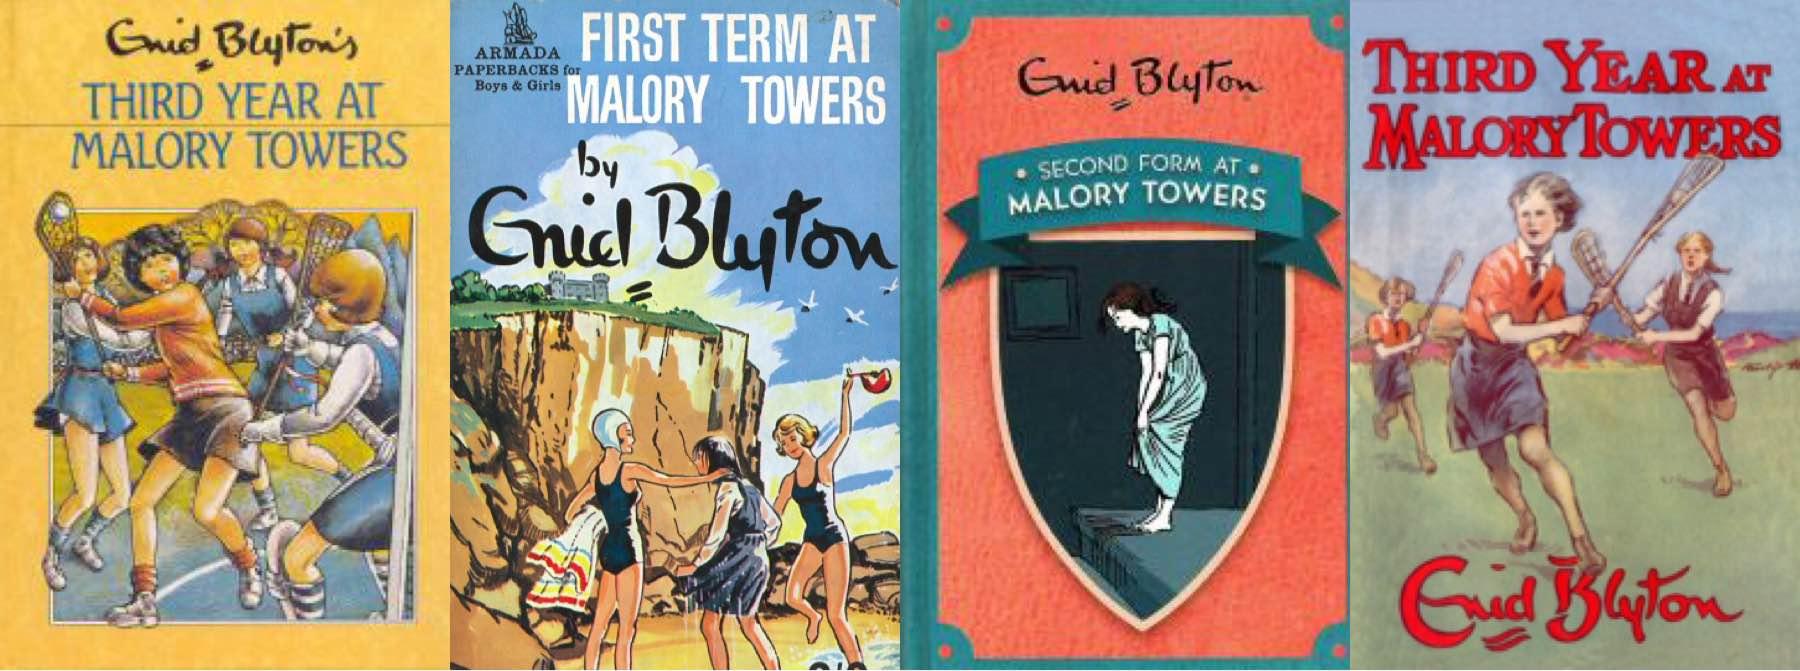 Enid Blyton's school stories tell truths that matter (no